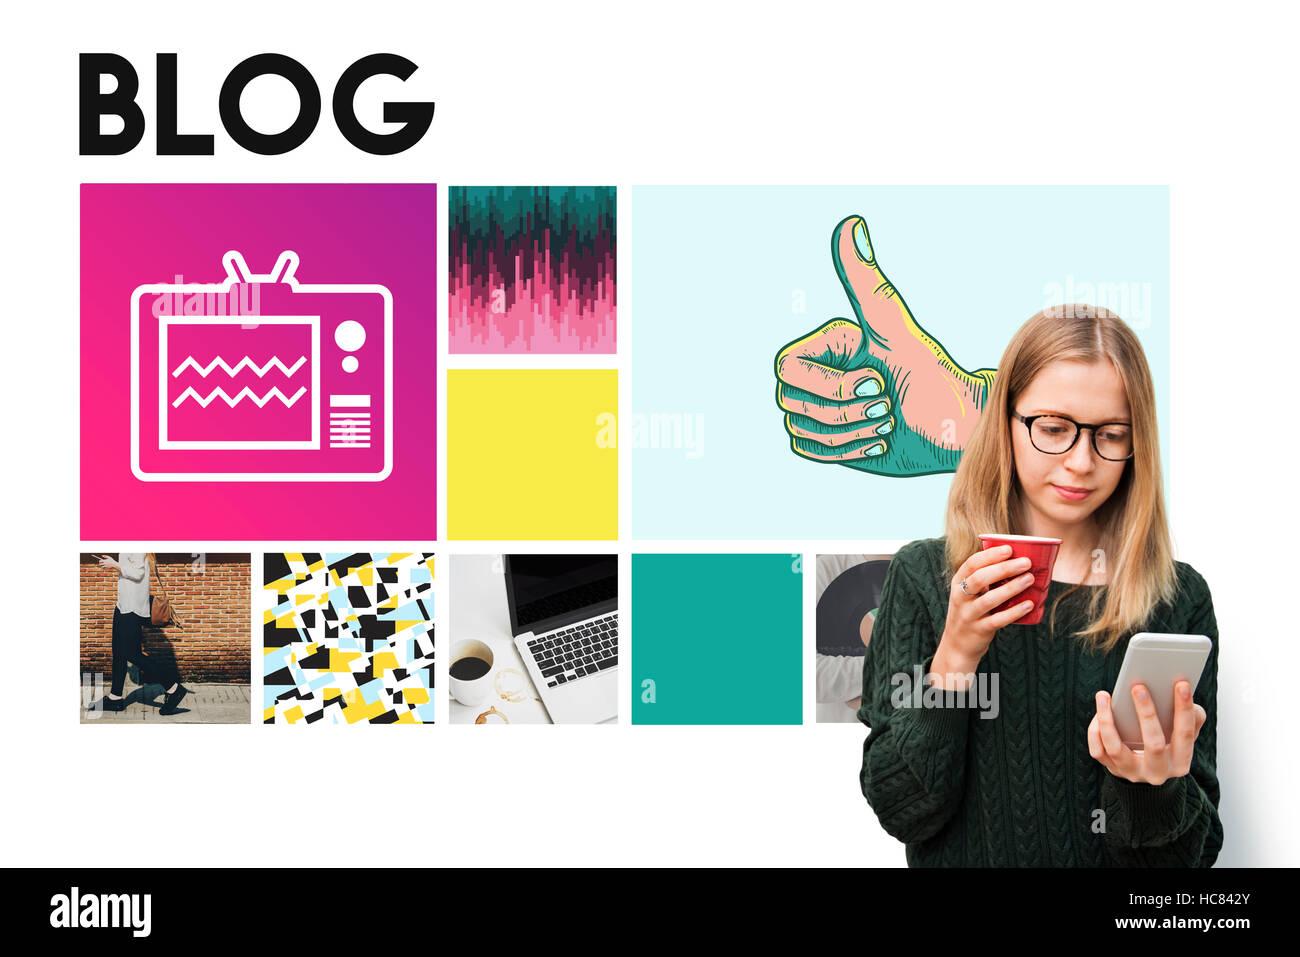 Blog Content Internet Post Site Social Story Web Concept - Stock Image